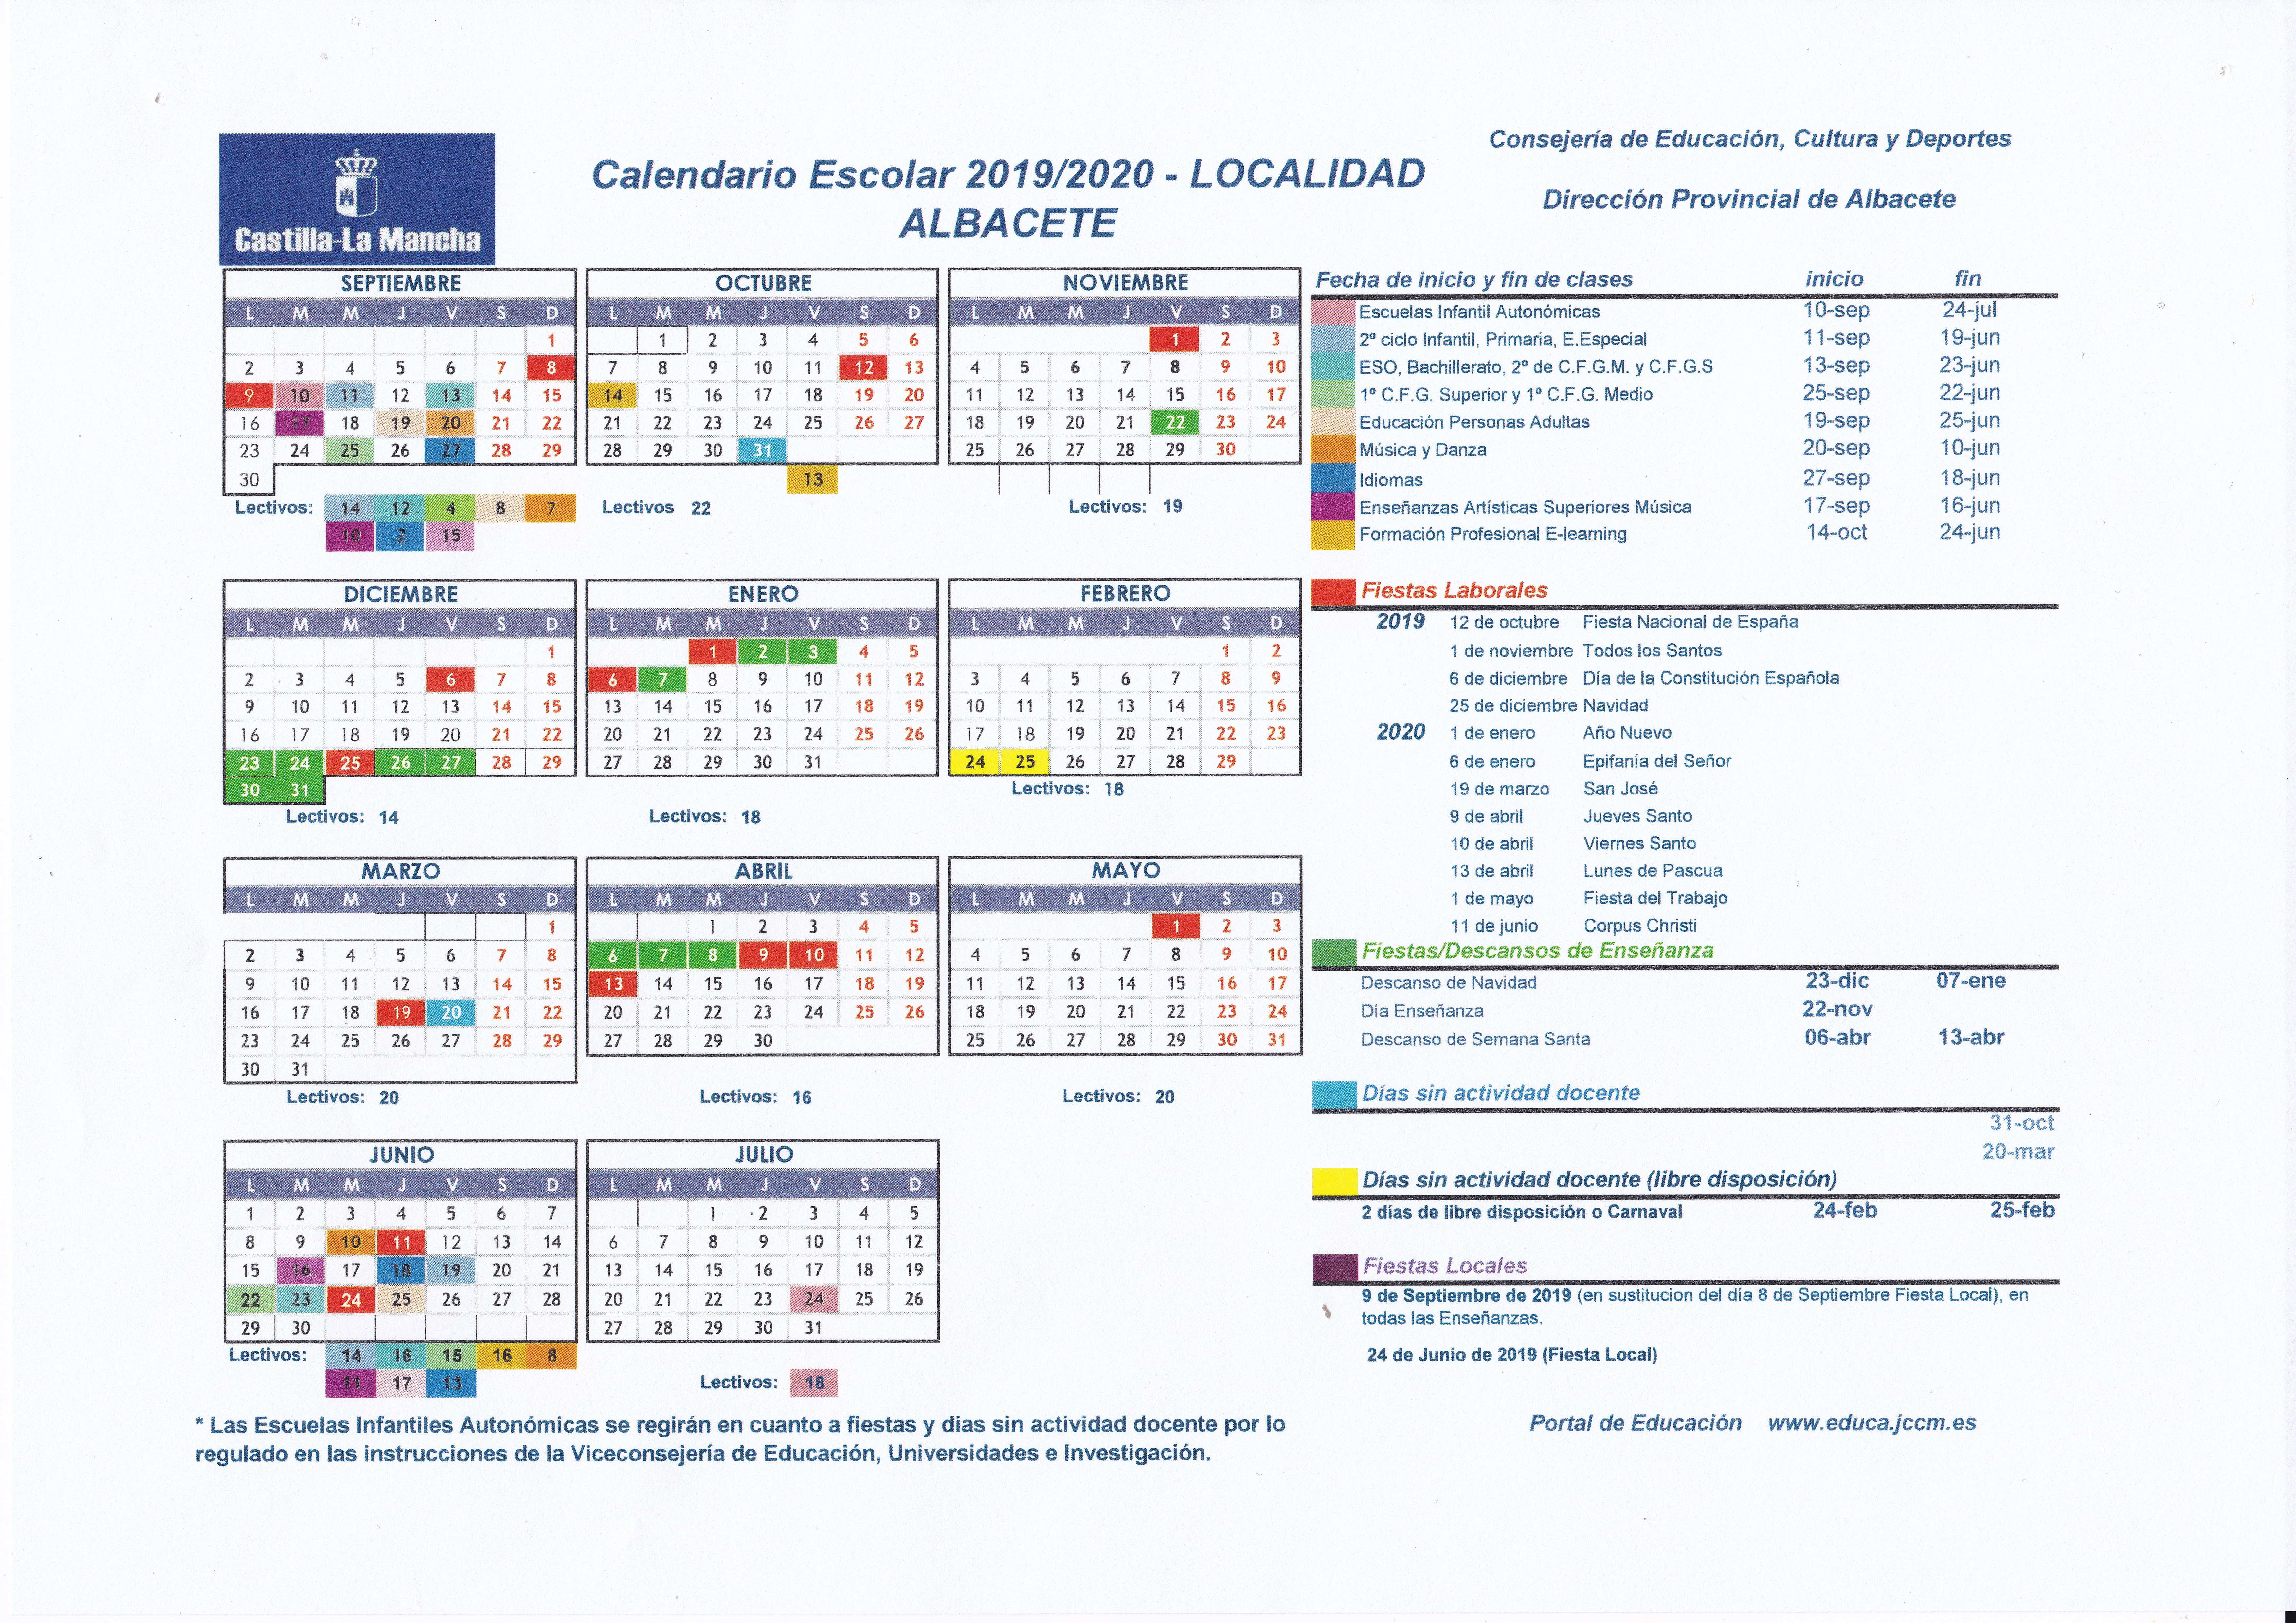 Calendario Escolar Asturias 2020 2019.Tablon De Anuncios Ceip Parque Sur Albacete